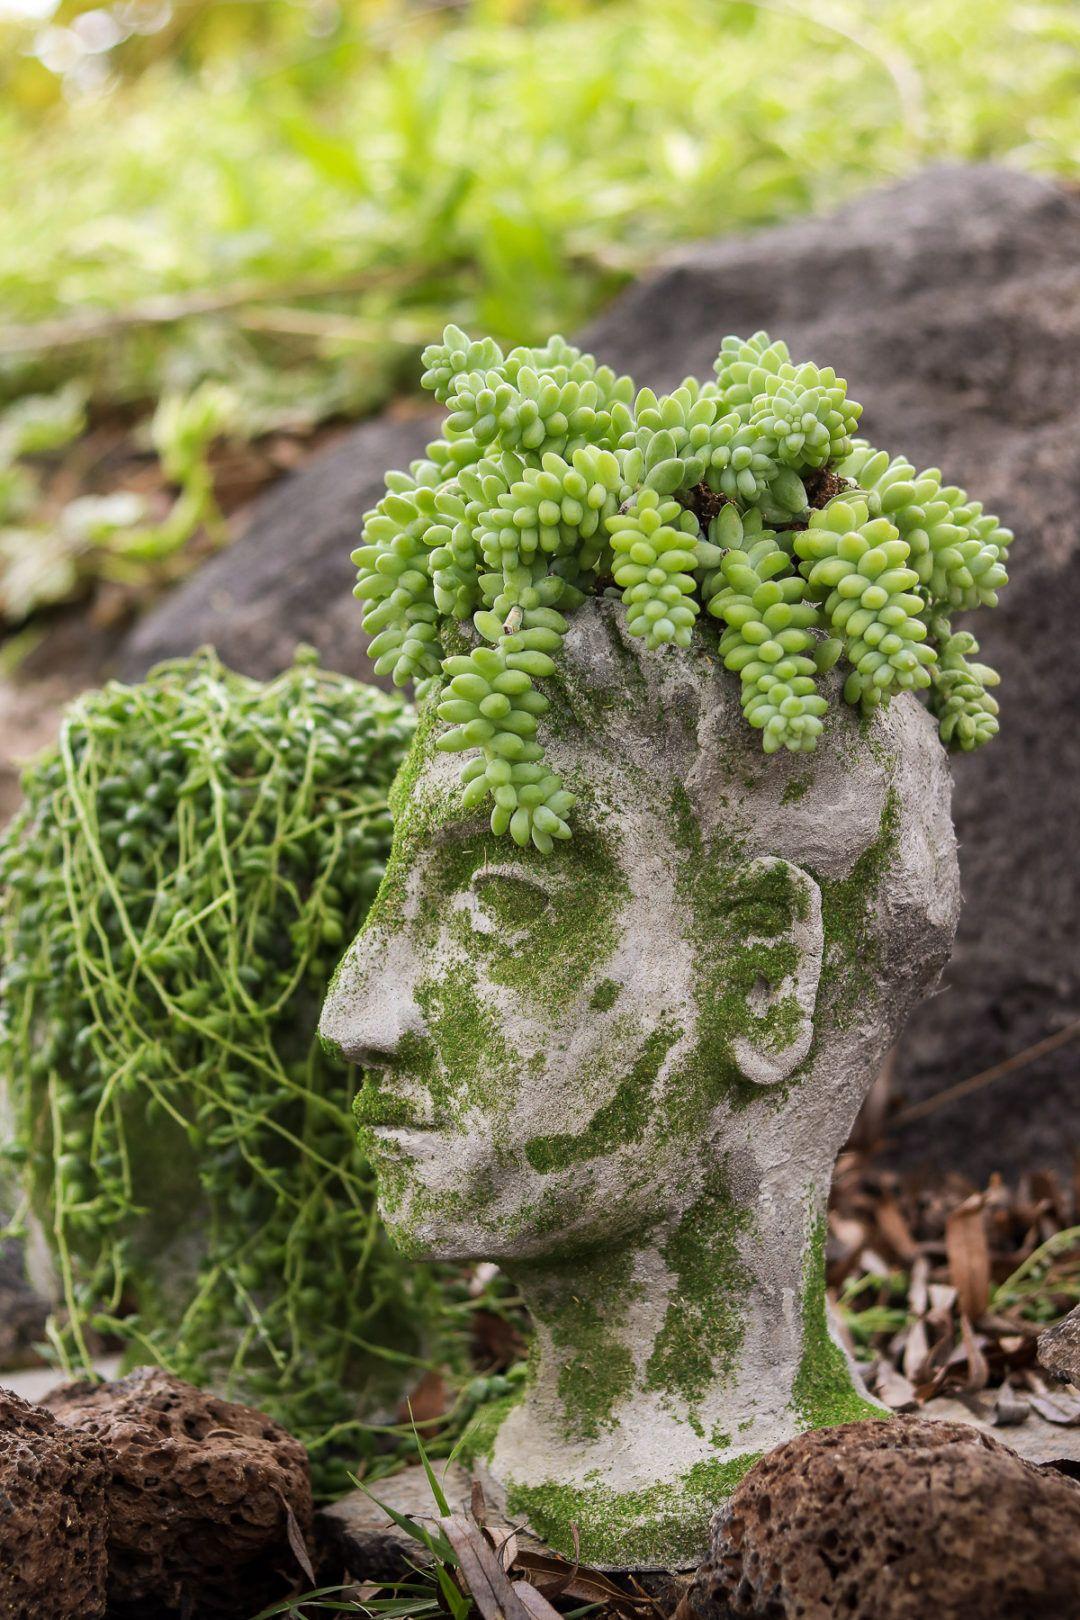 Diy Head Planter Using Concrete Garden Diys Head 640 x 480